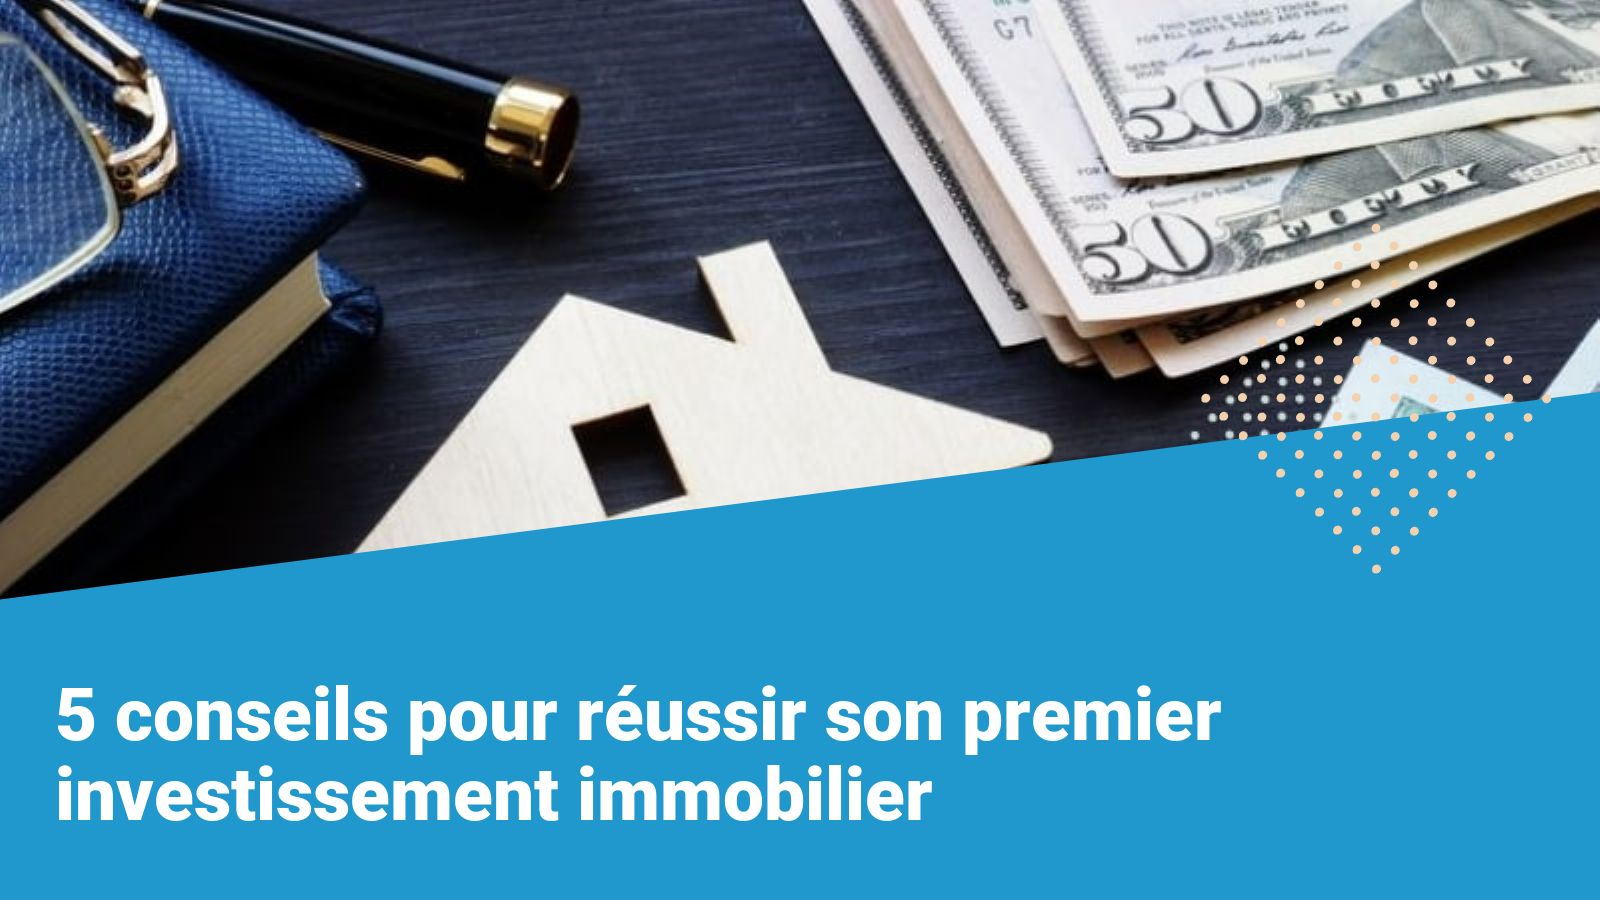 reussir son premier investissement immobilier